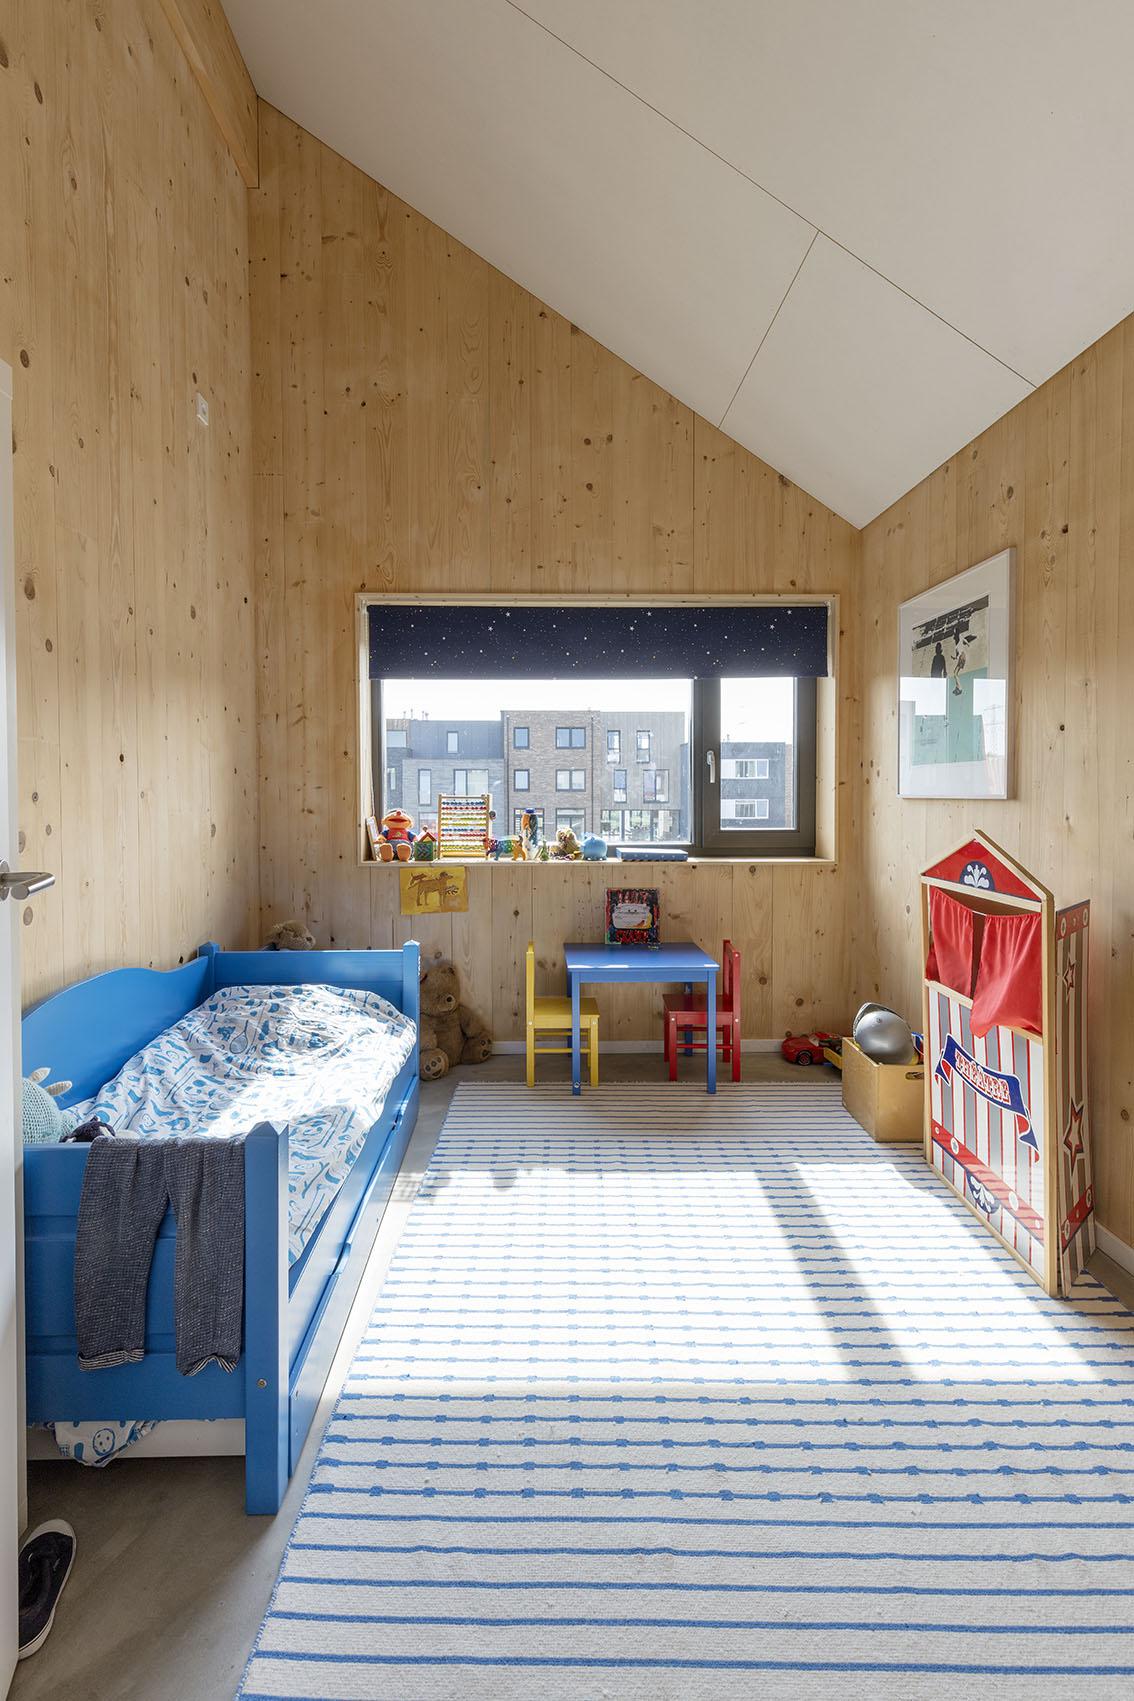 <p>Kavel 17 &#8211; kinderslaapkamer  foto: Marcel van der Burg</p>